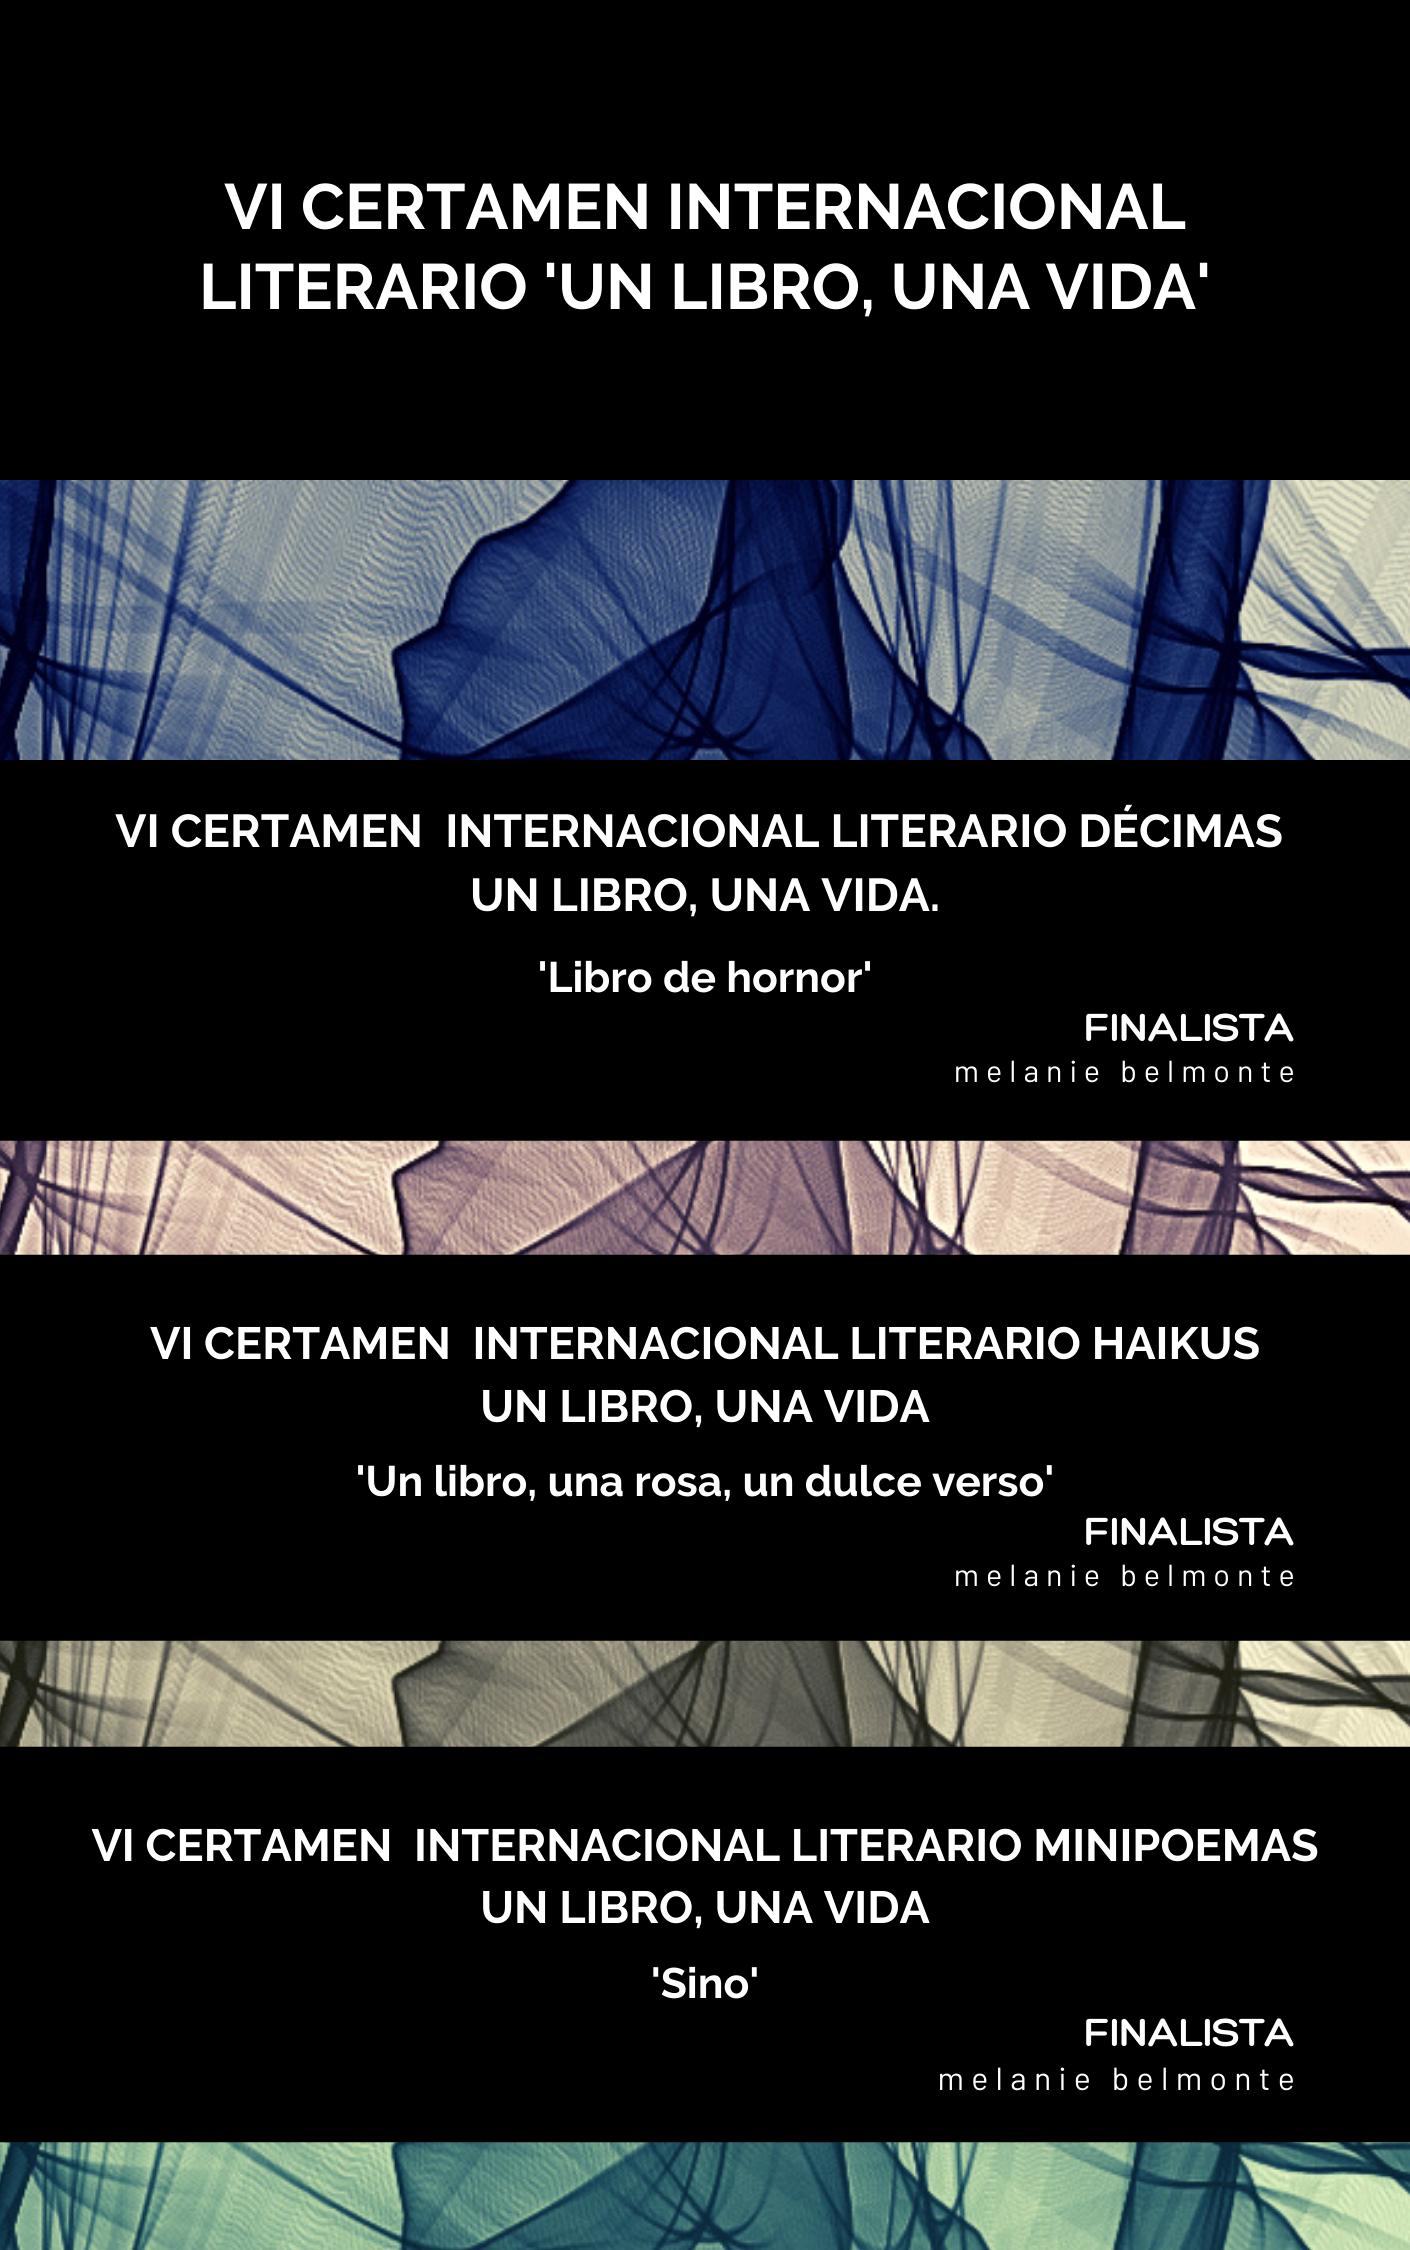 VI Certamen Internacional Literario de D